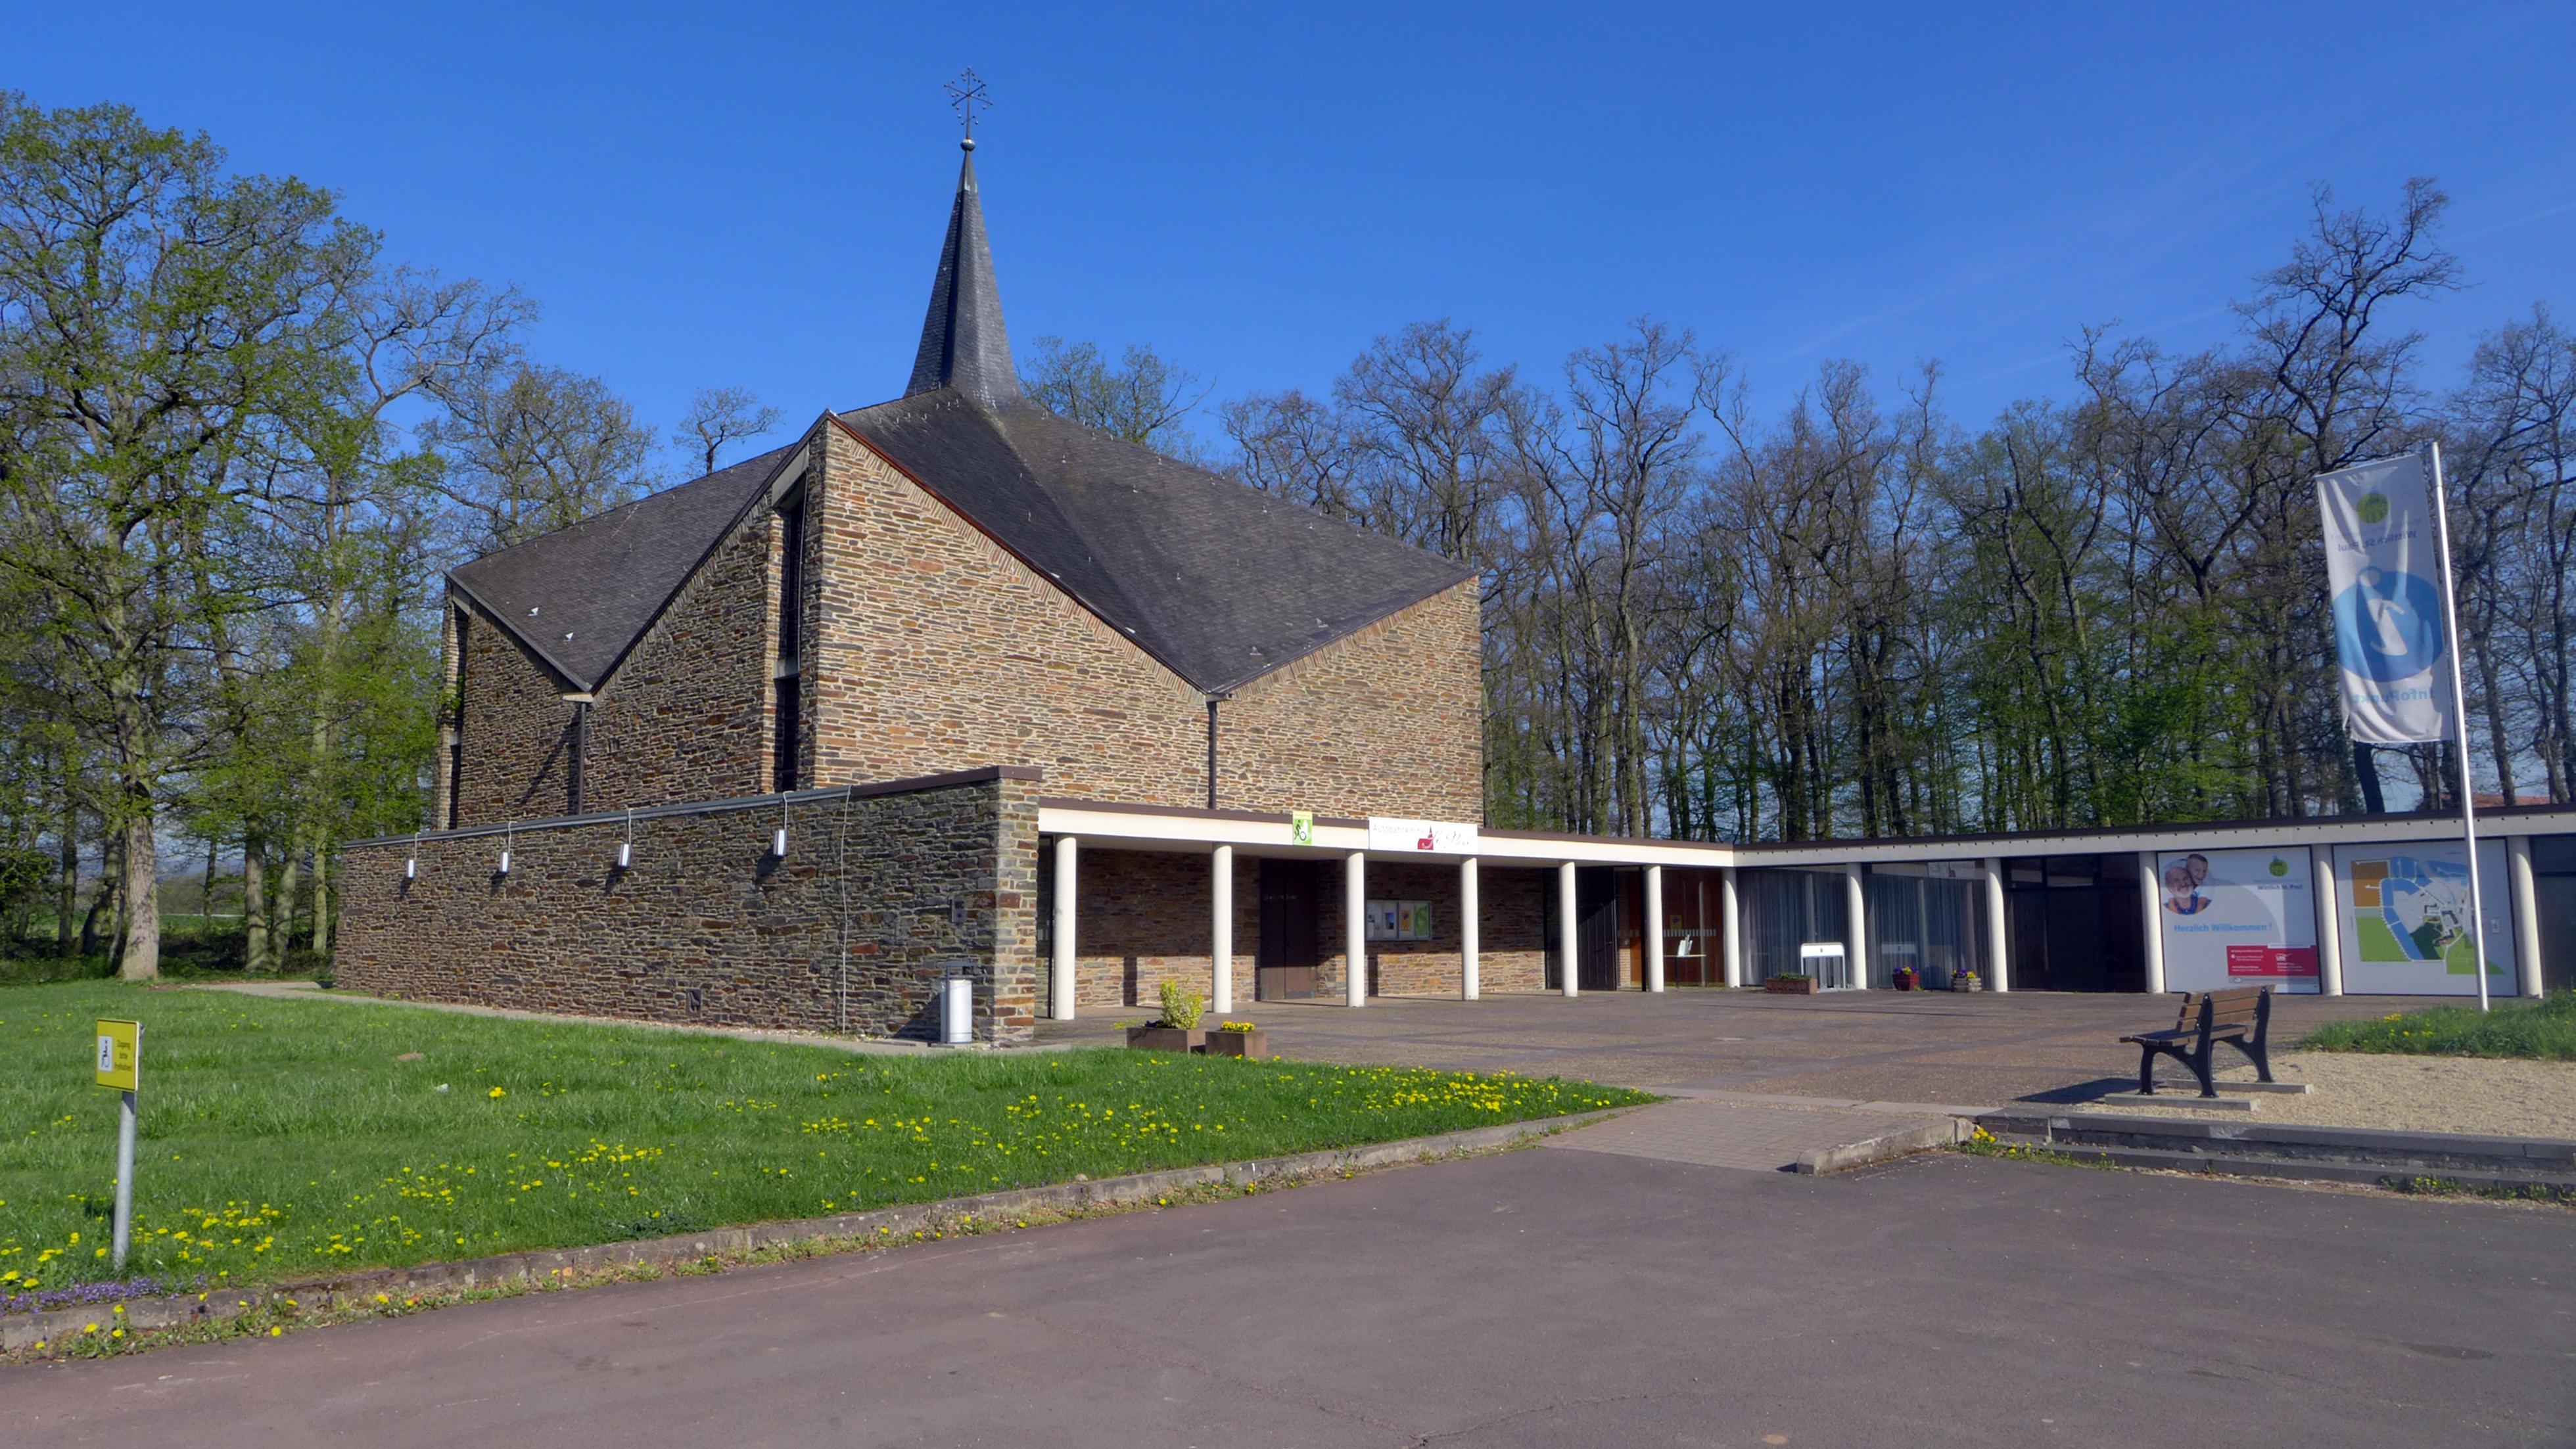 Autobahnkirche St. Paul in Wittlich